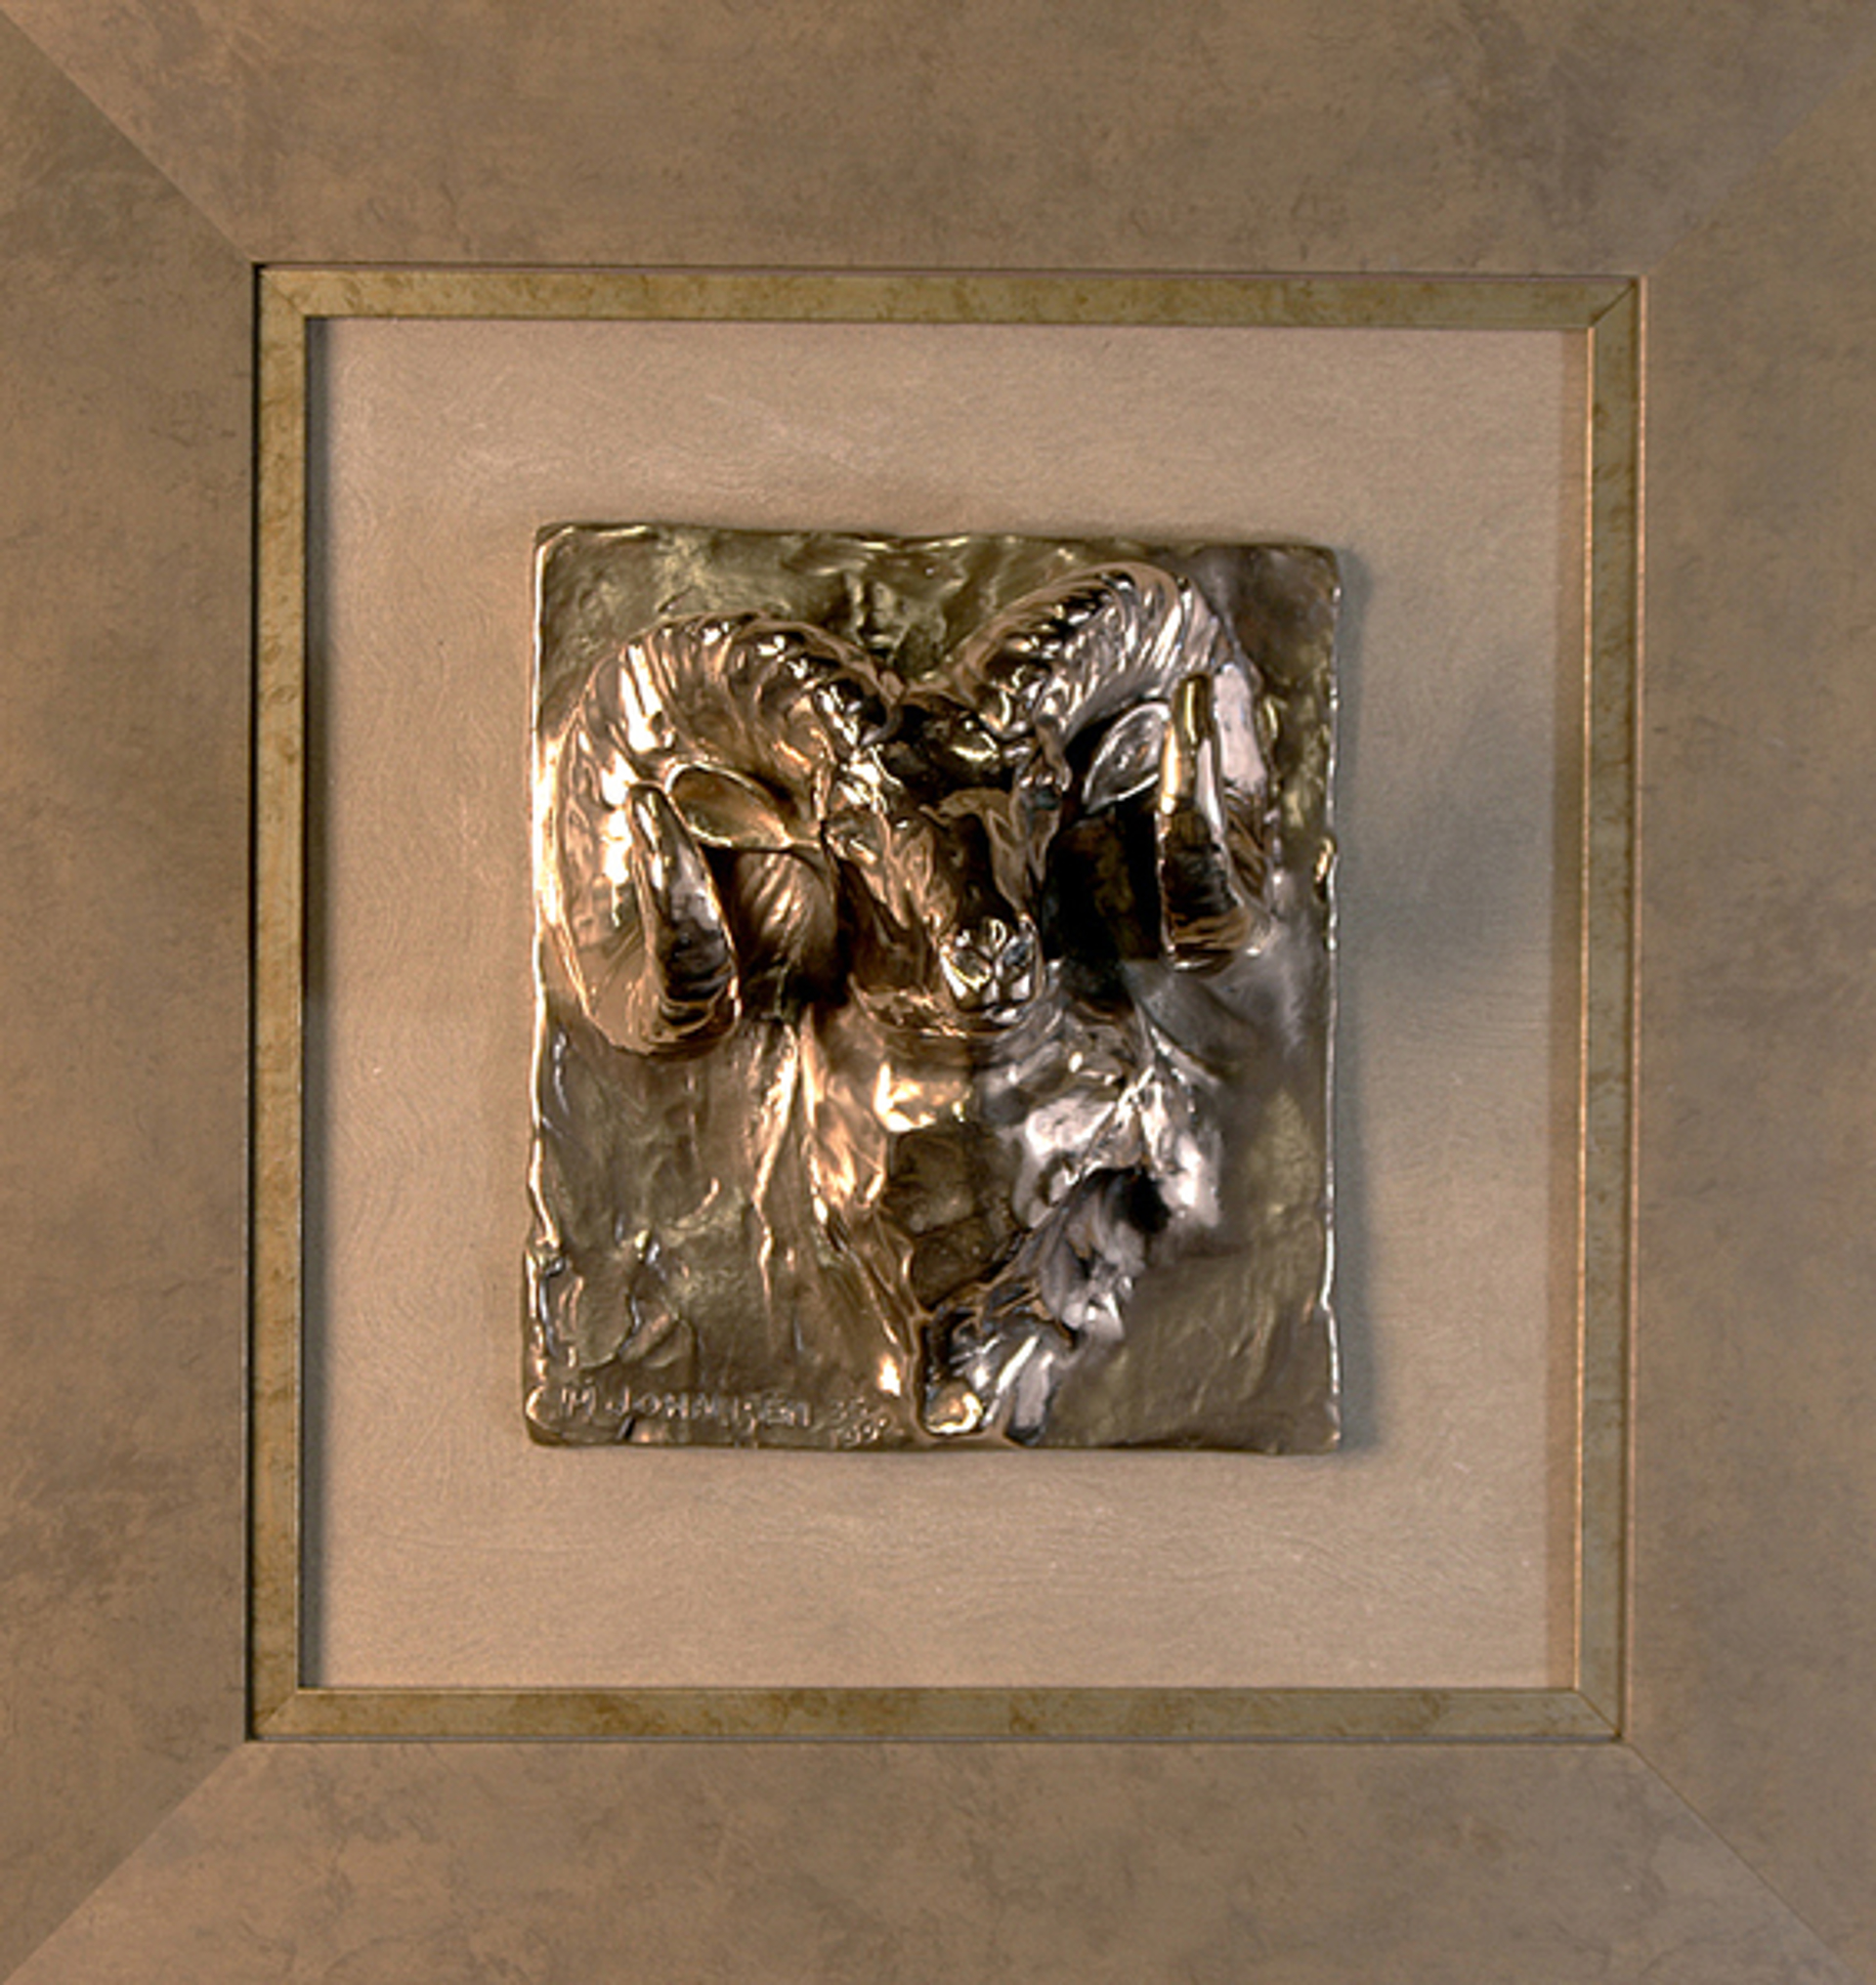 Ram Head Framed Relief by Melvin Johansen